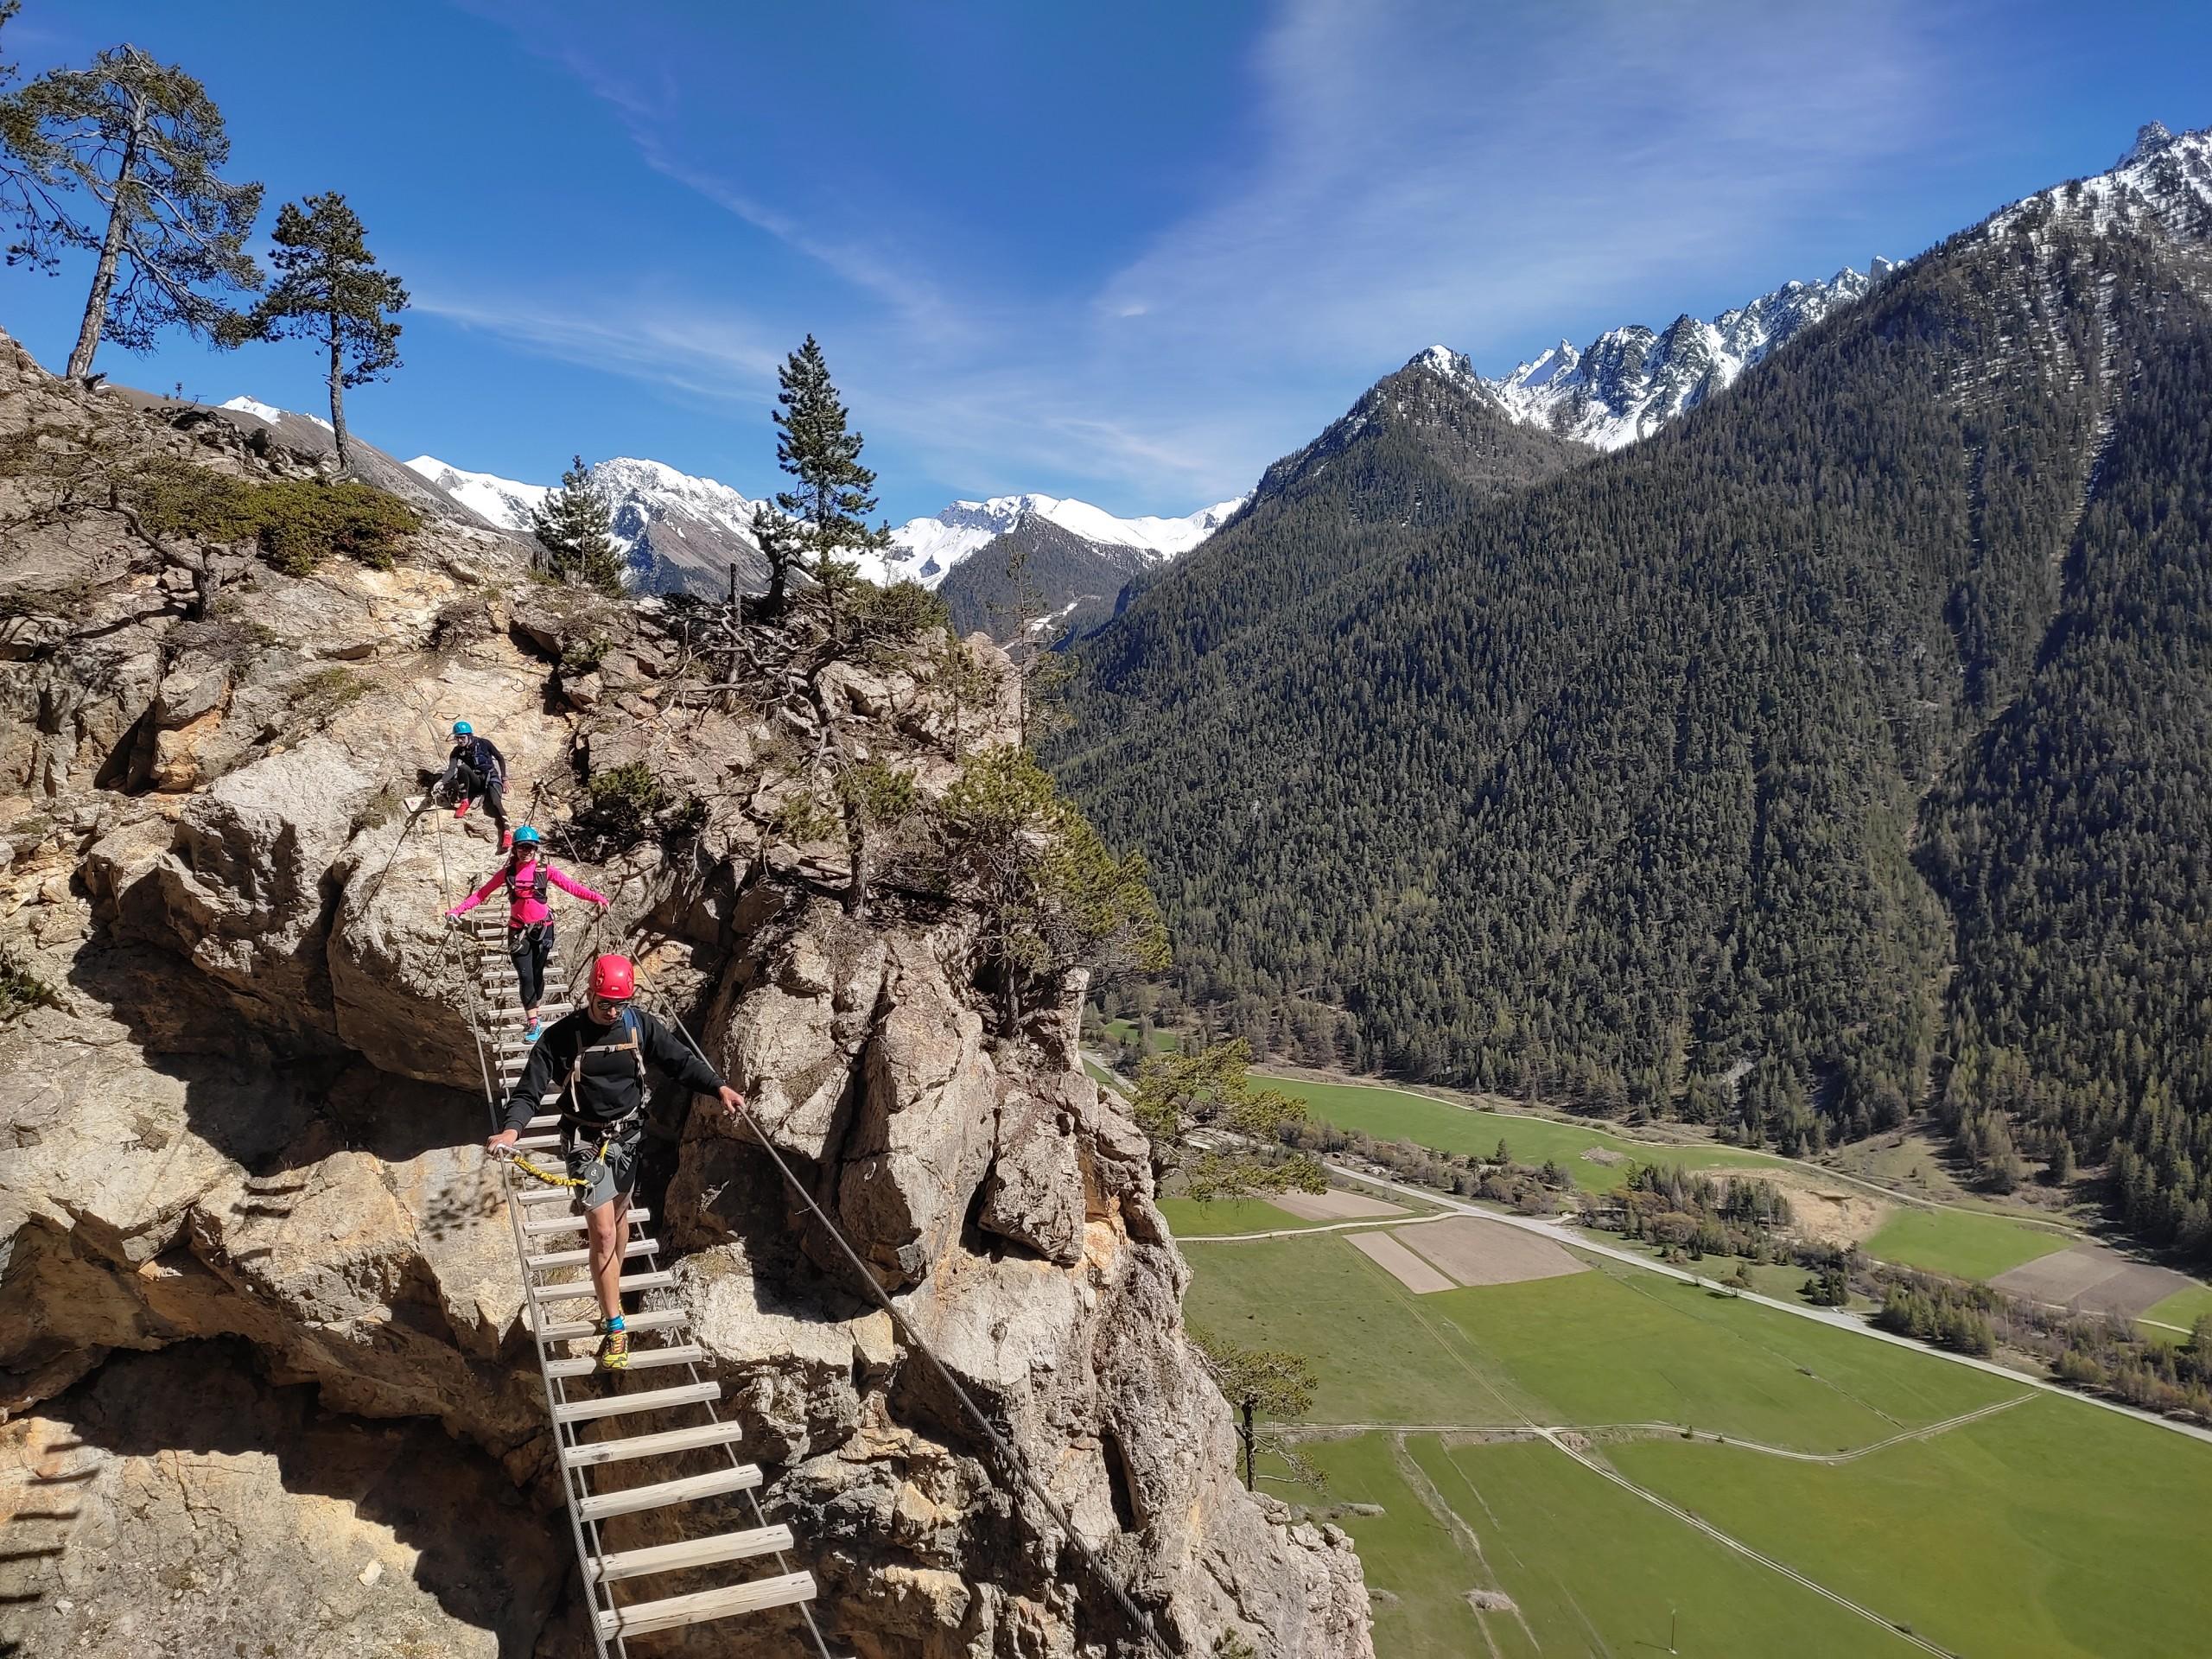 La passerelle de la via ferrata de Ceillac dans le massif du Queyras